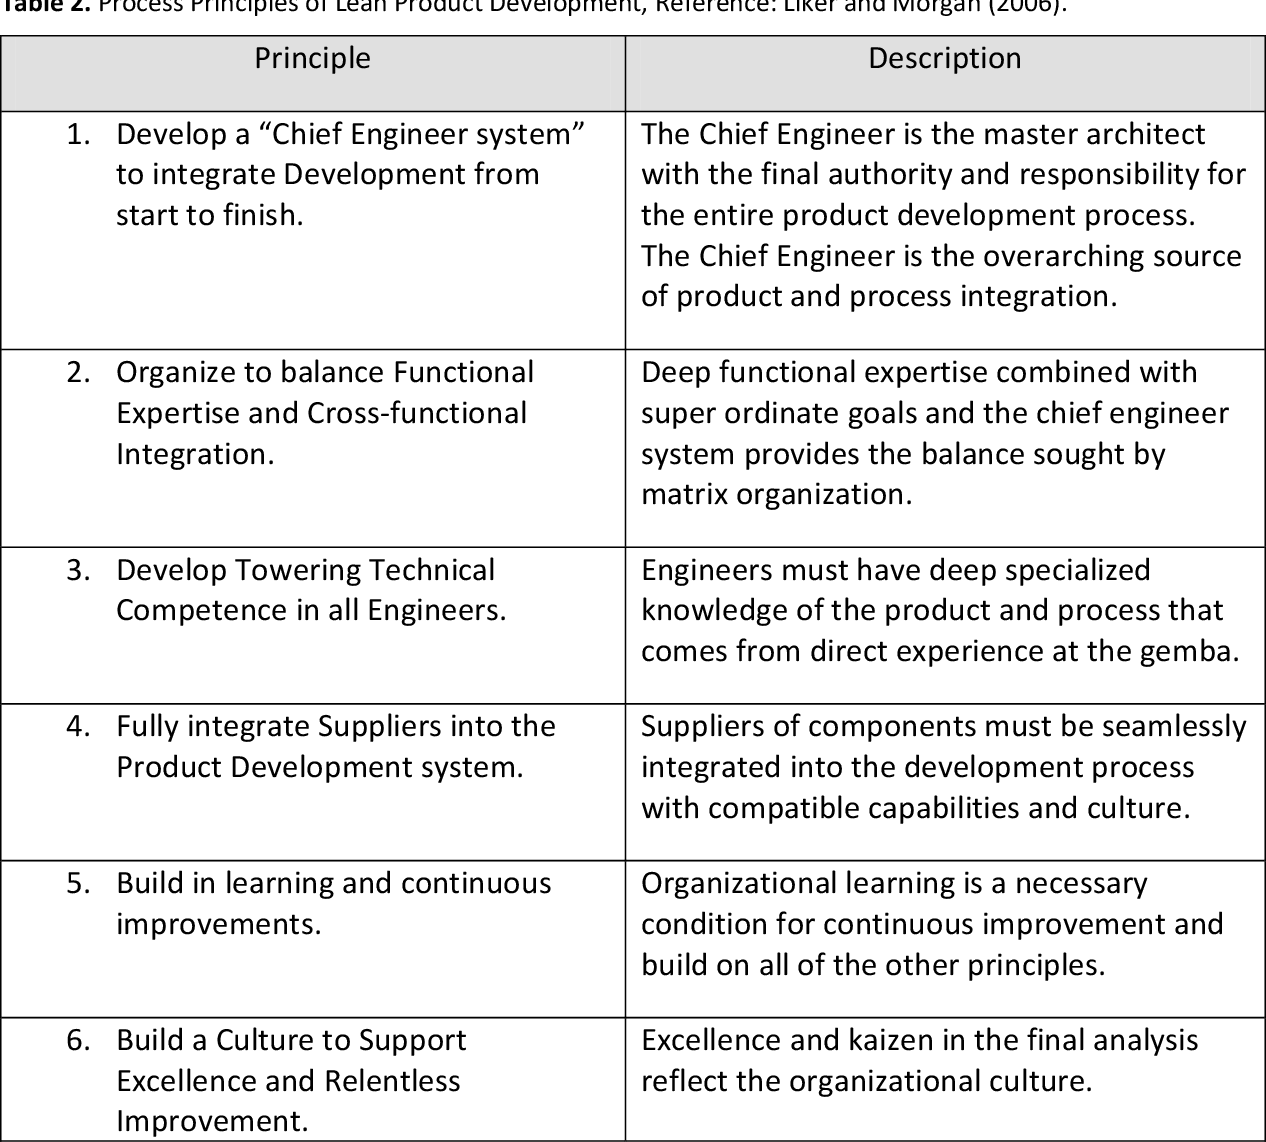 Google Translator Toolkit - Semantic Scholar